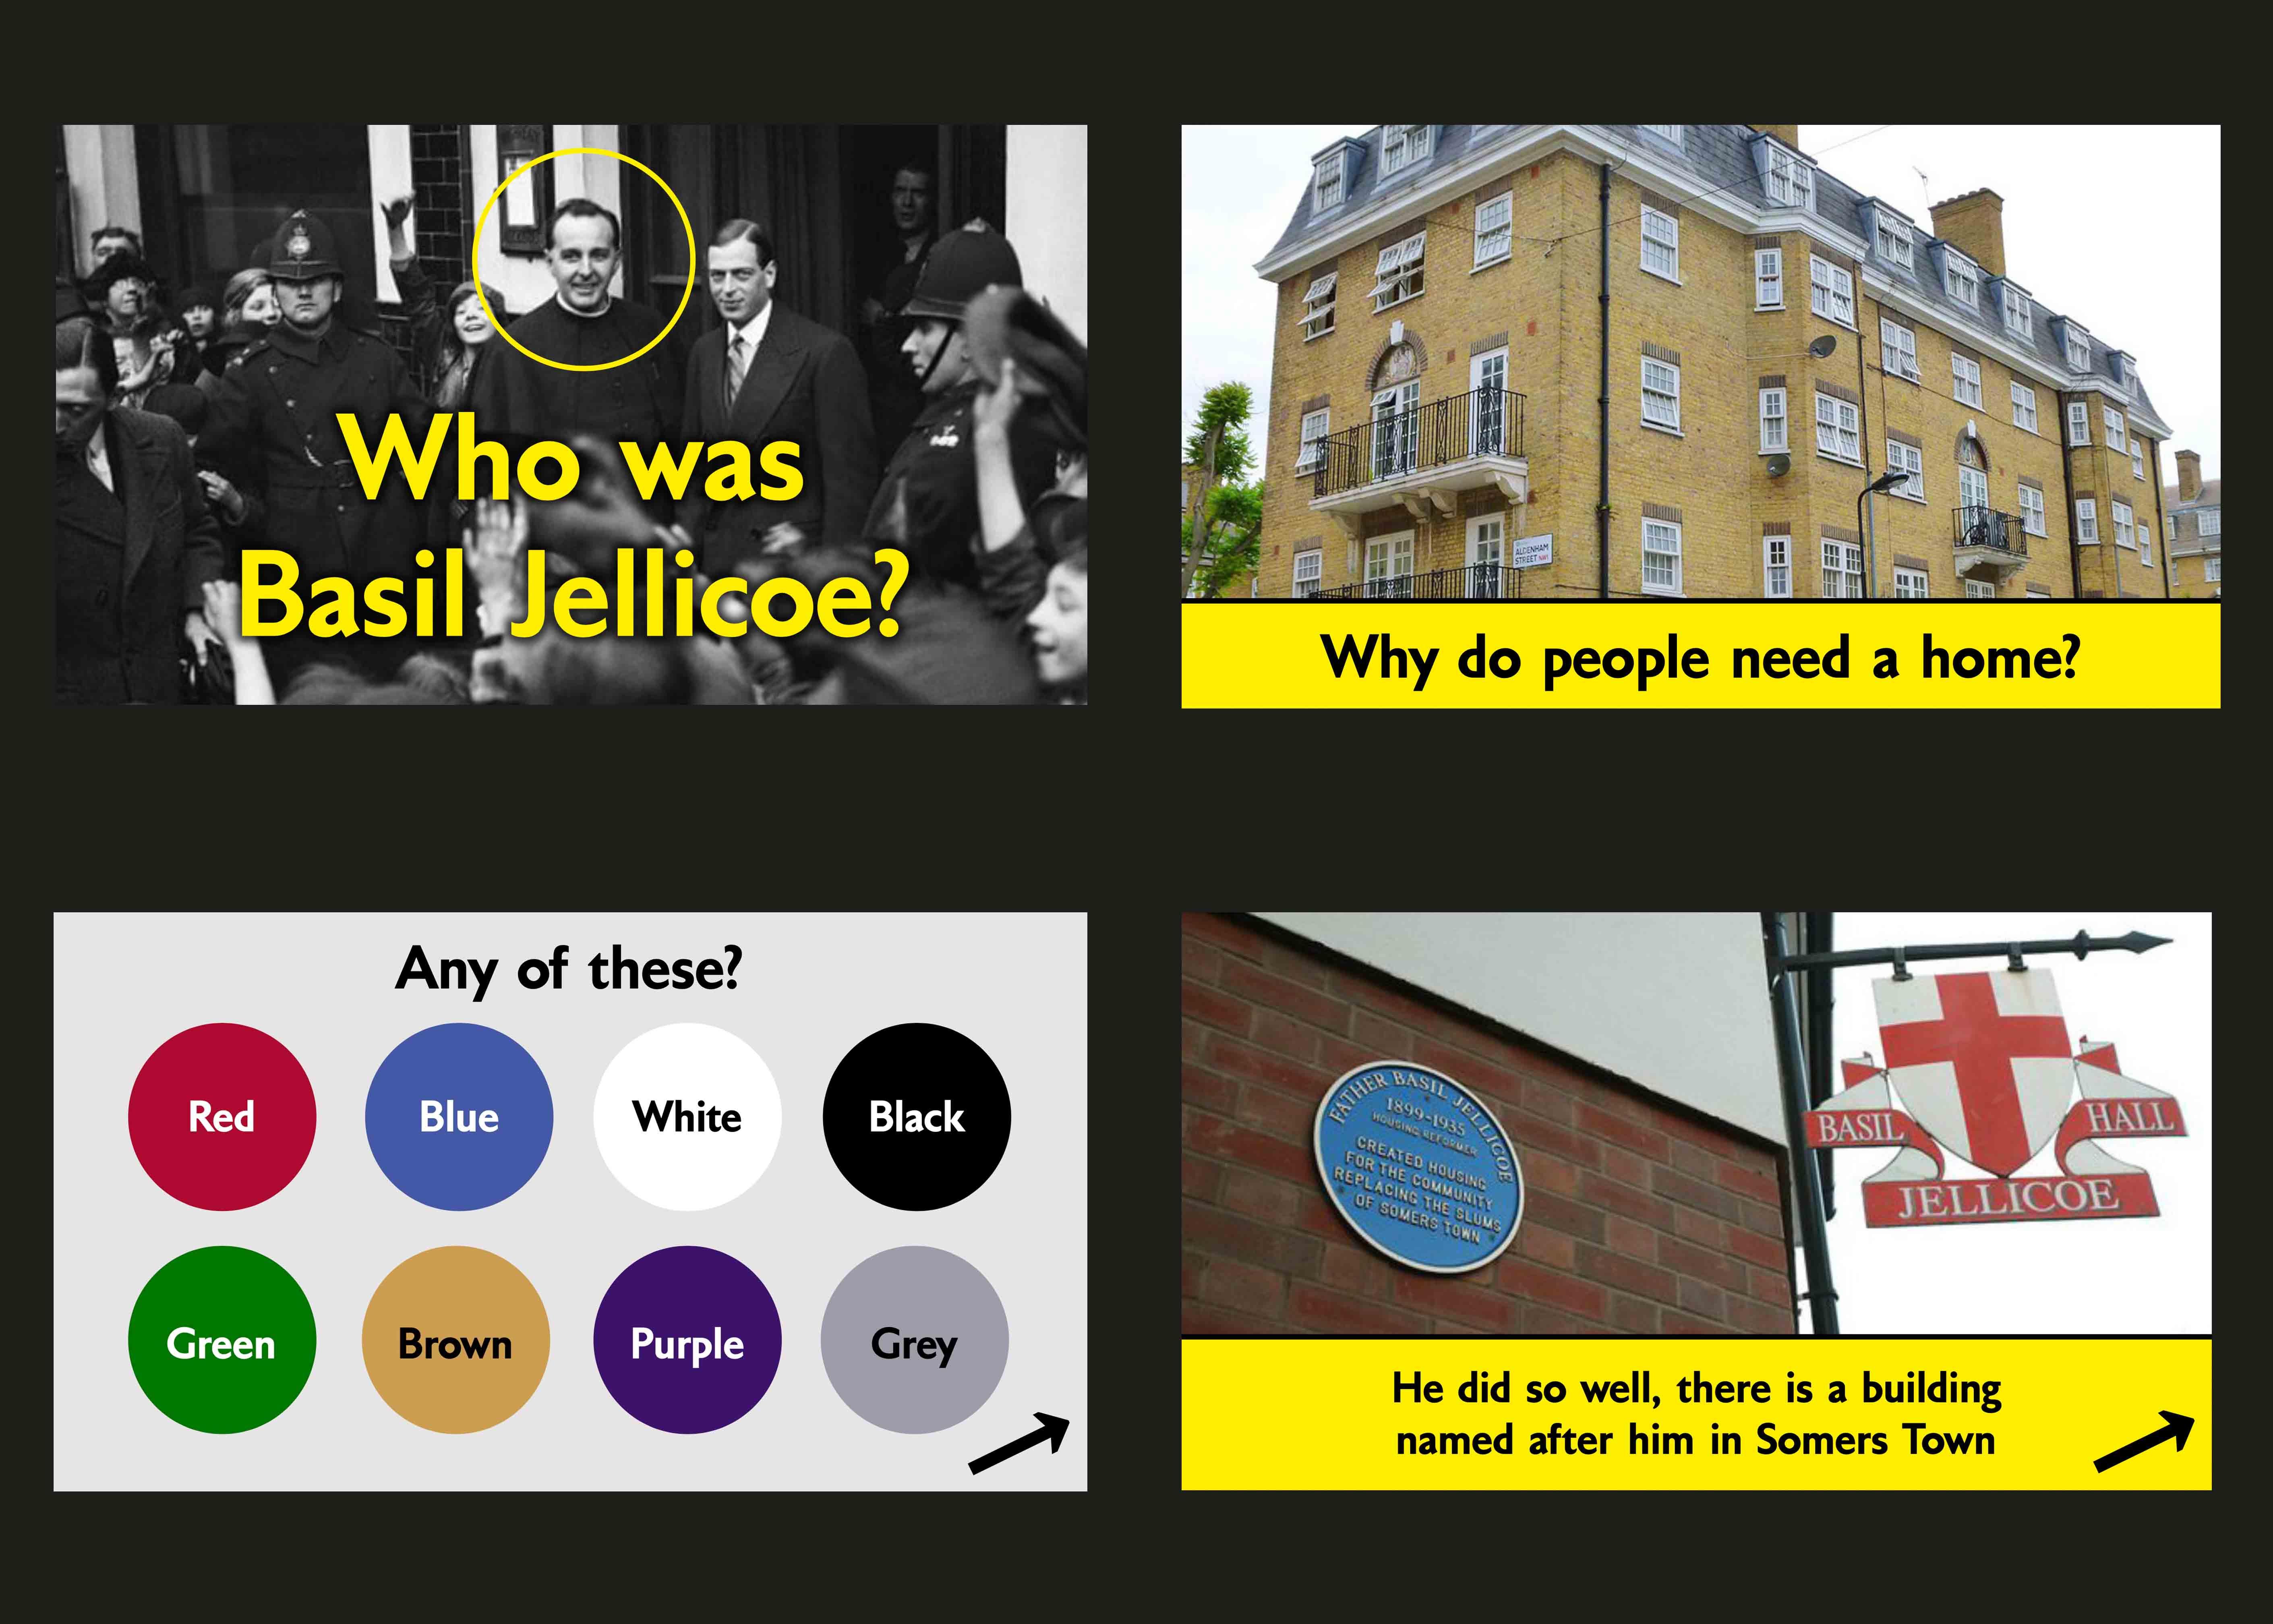 Slides from a presentation on Basil Jellicoe